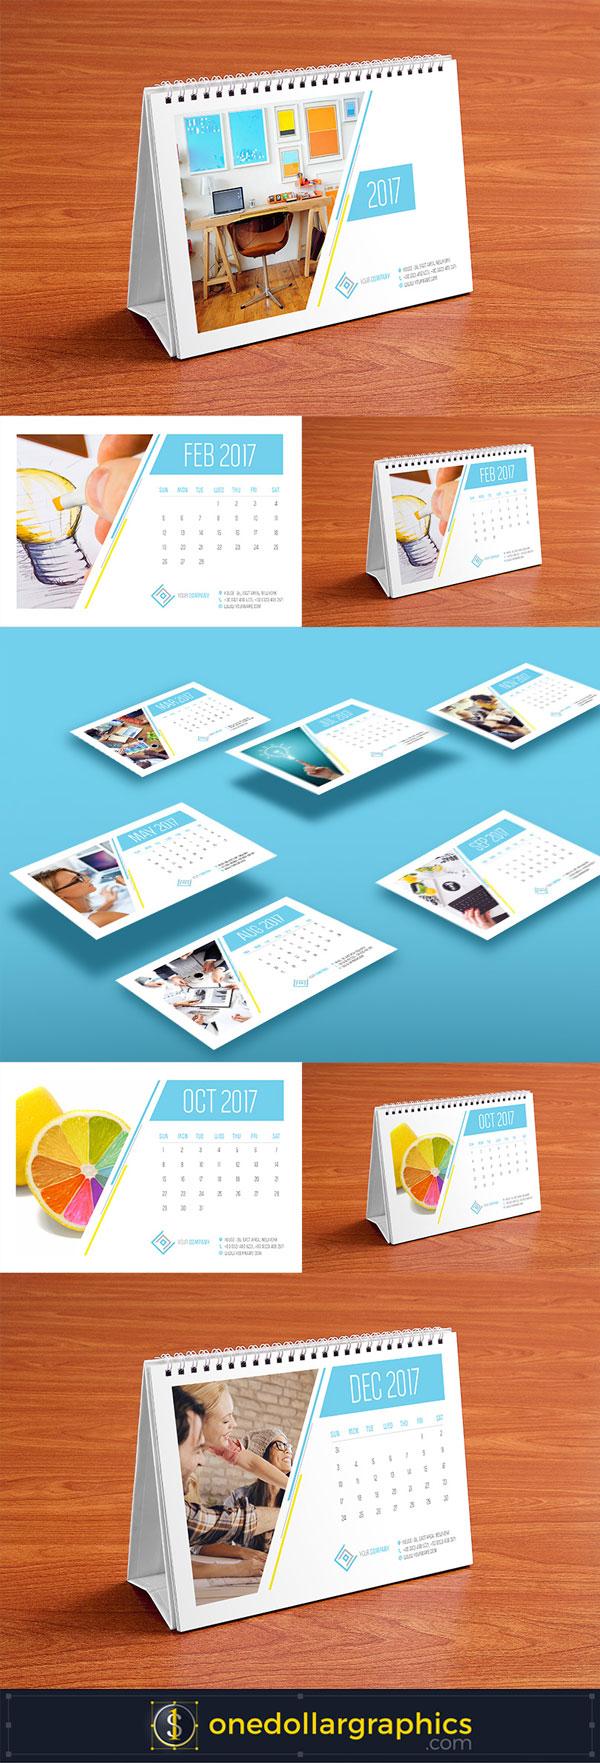 table-calendar-mock-up-psd-with-design-templates-2017